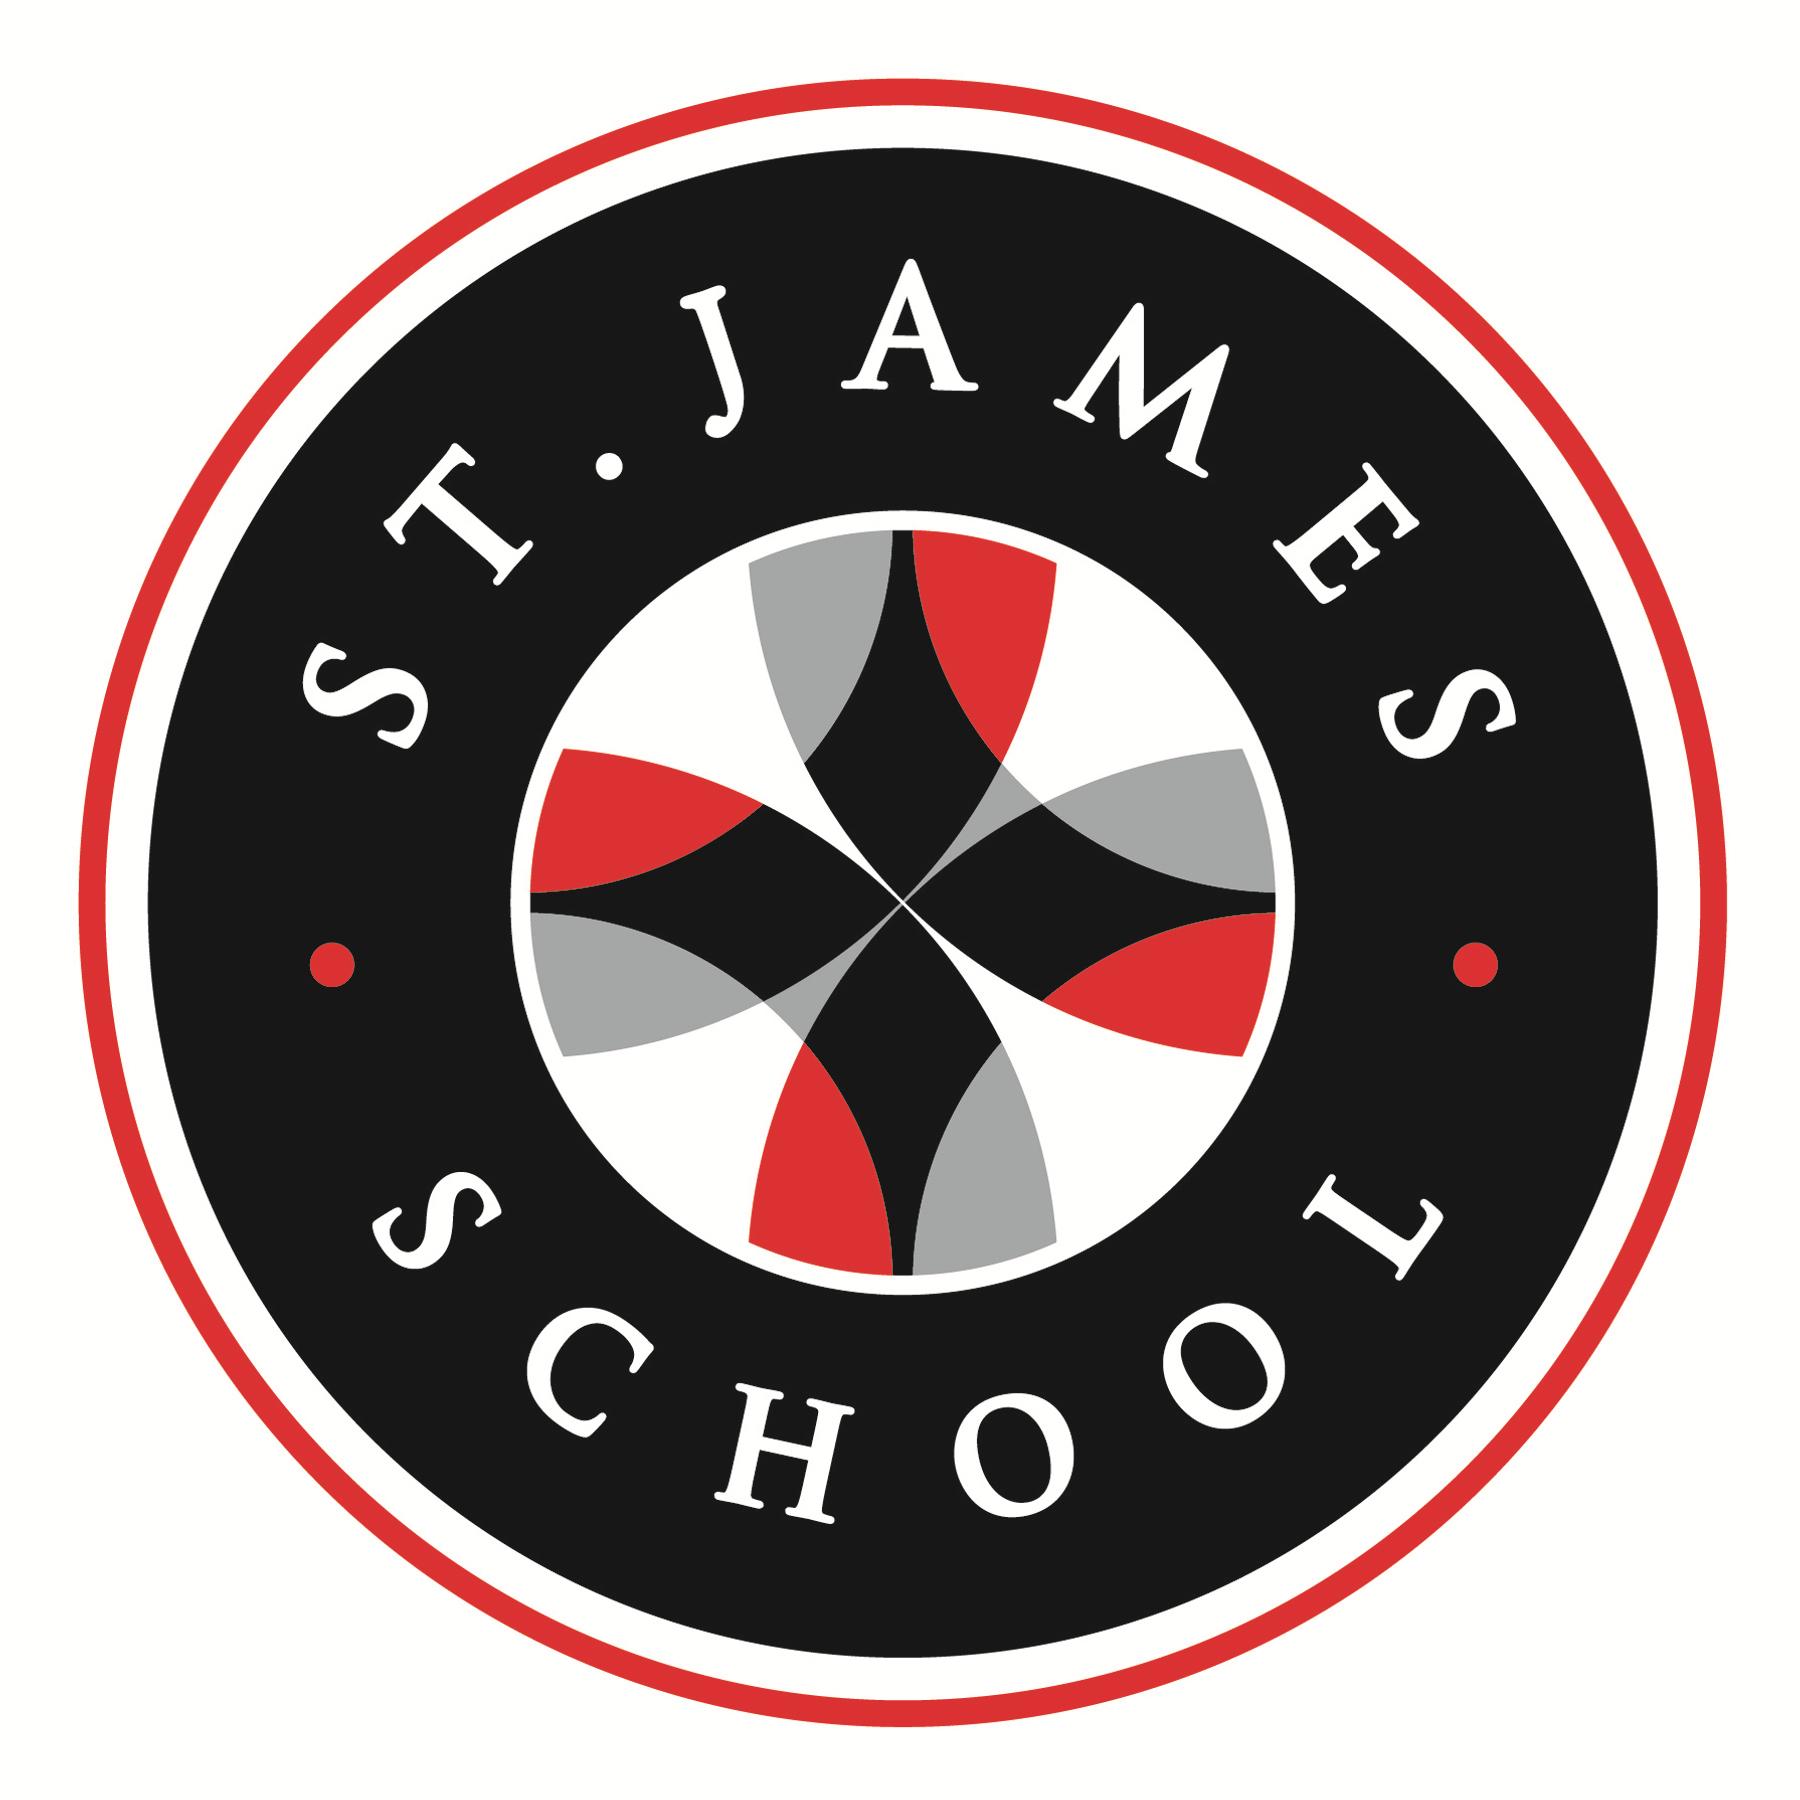 St. James School Company Logo